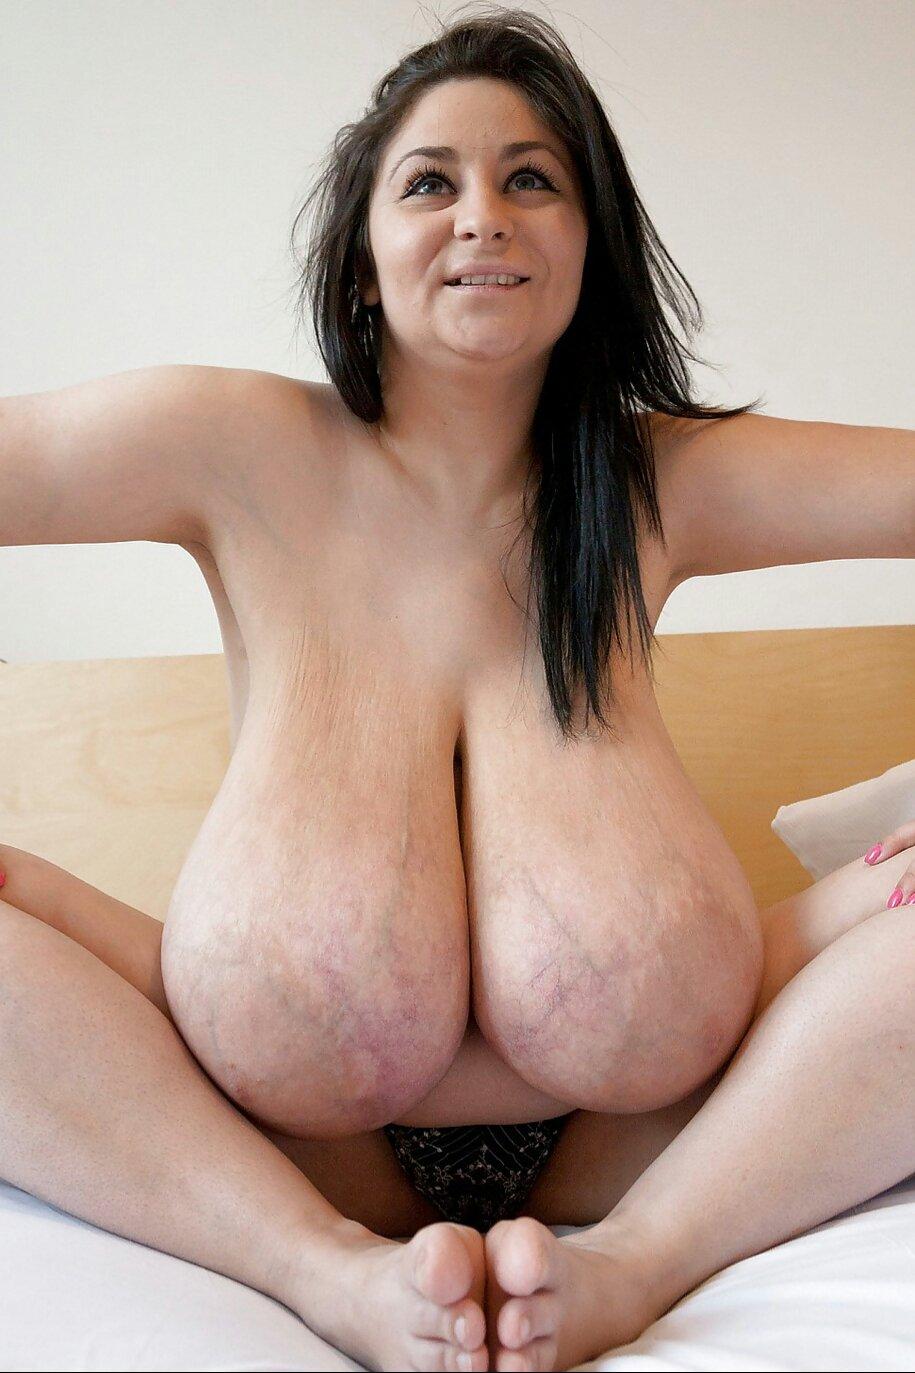 Dangling Breasts